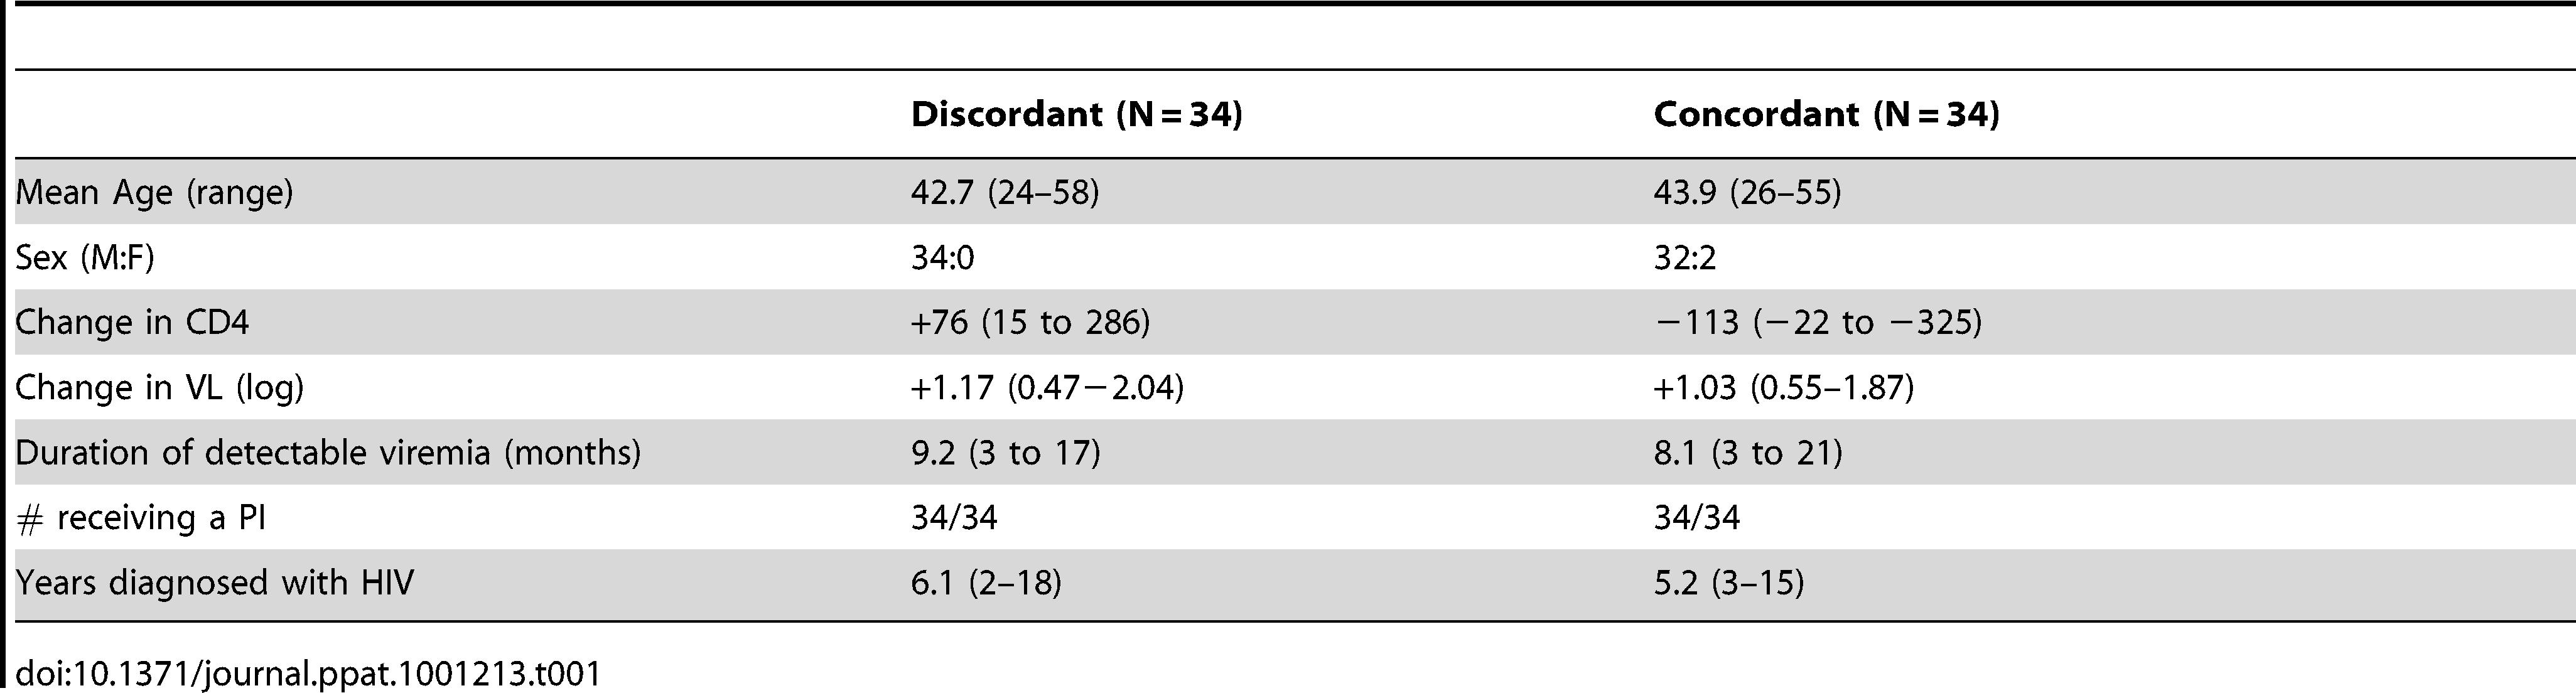 Demographics of discordant and concordant patients.